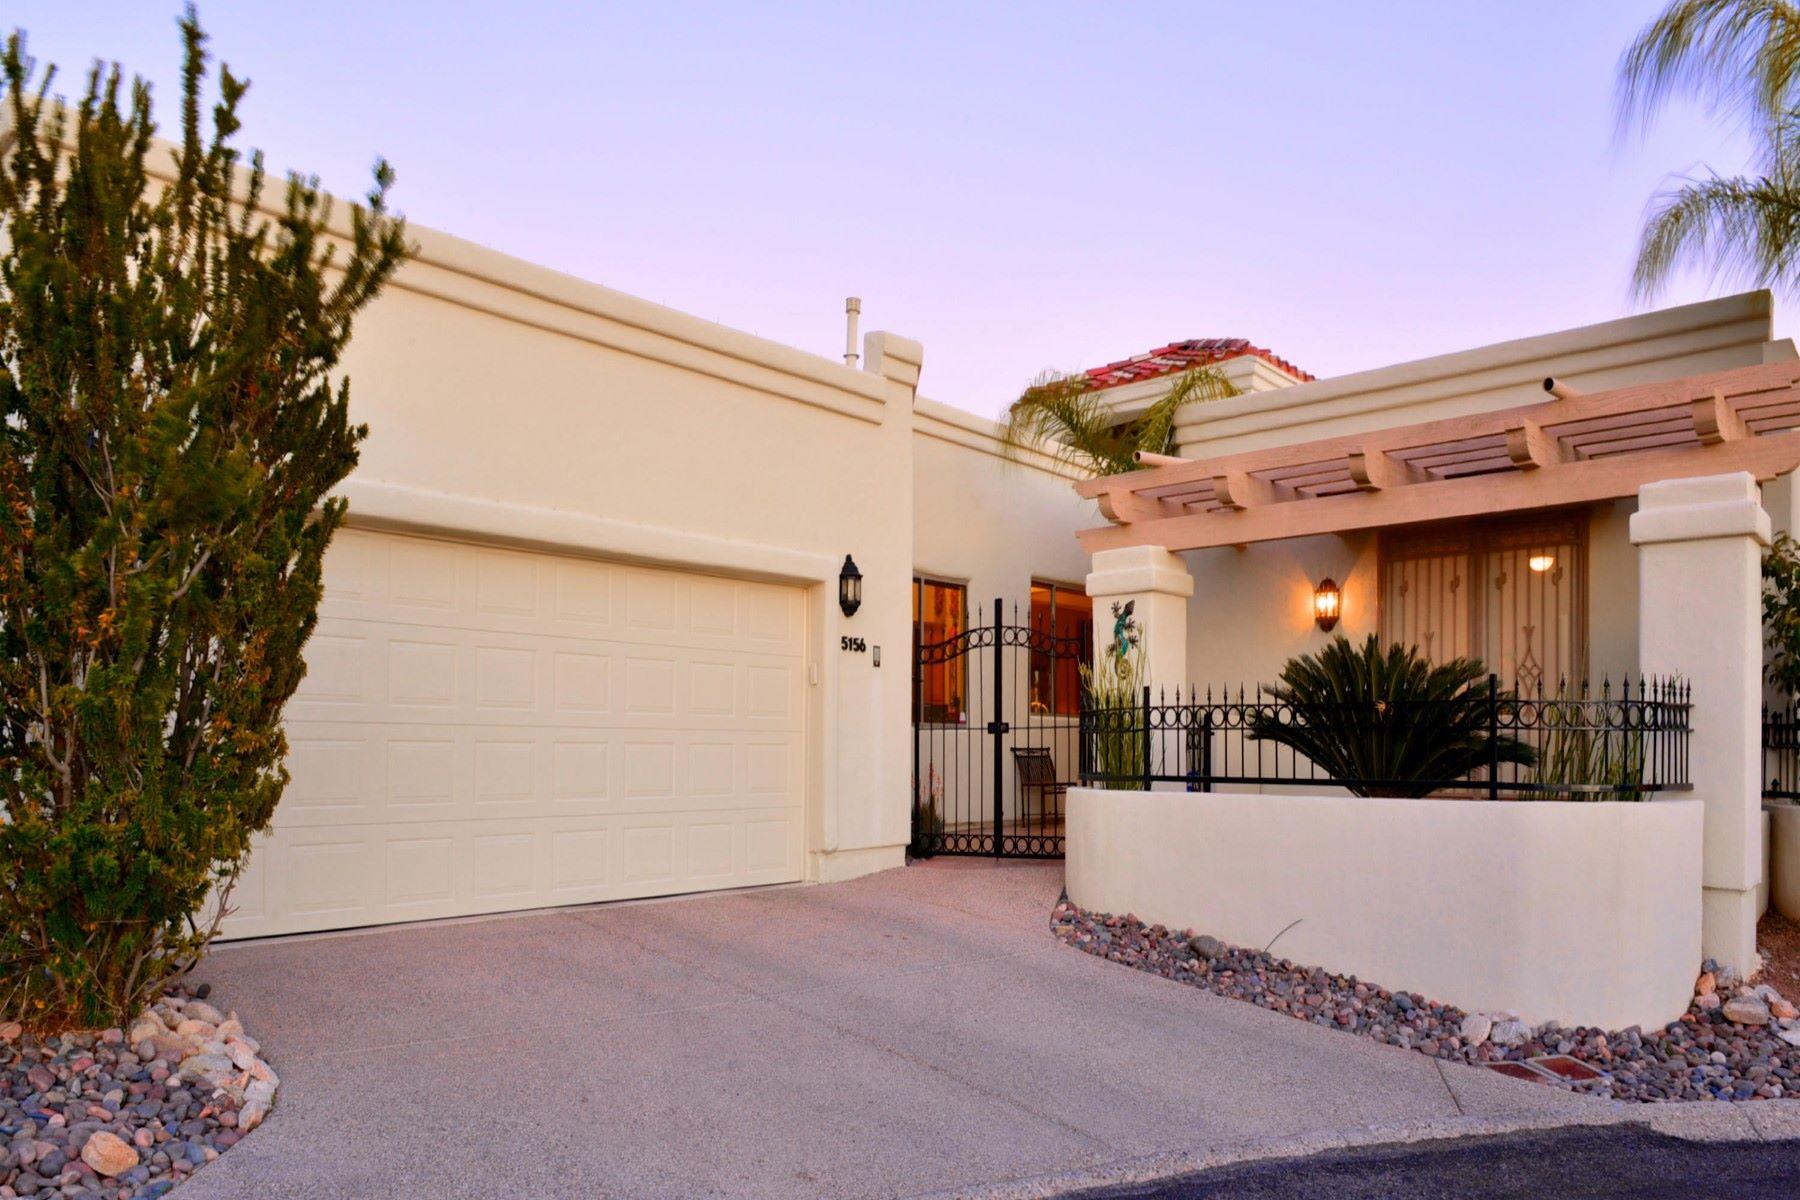 独户住宅 为 销售 在 Elegant and spacious town home 5156 E Calle Brillante 图森, 亚利桑那州, 85718 美国